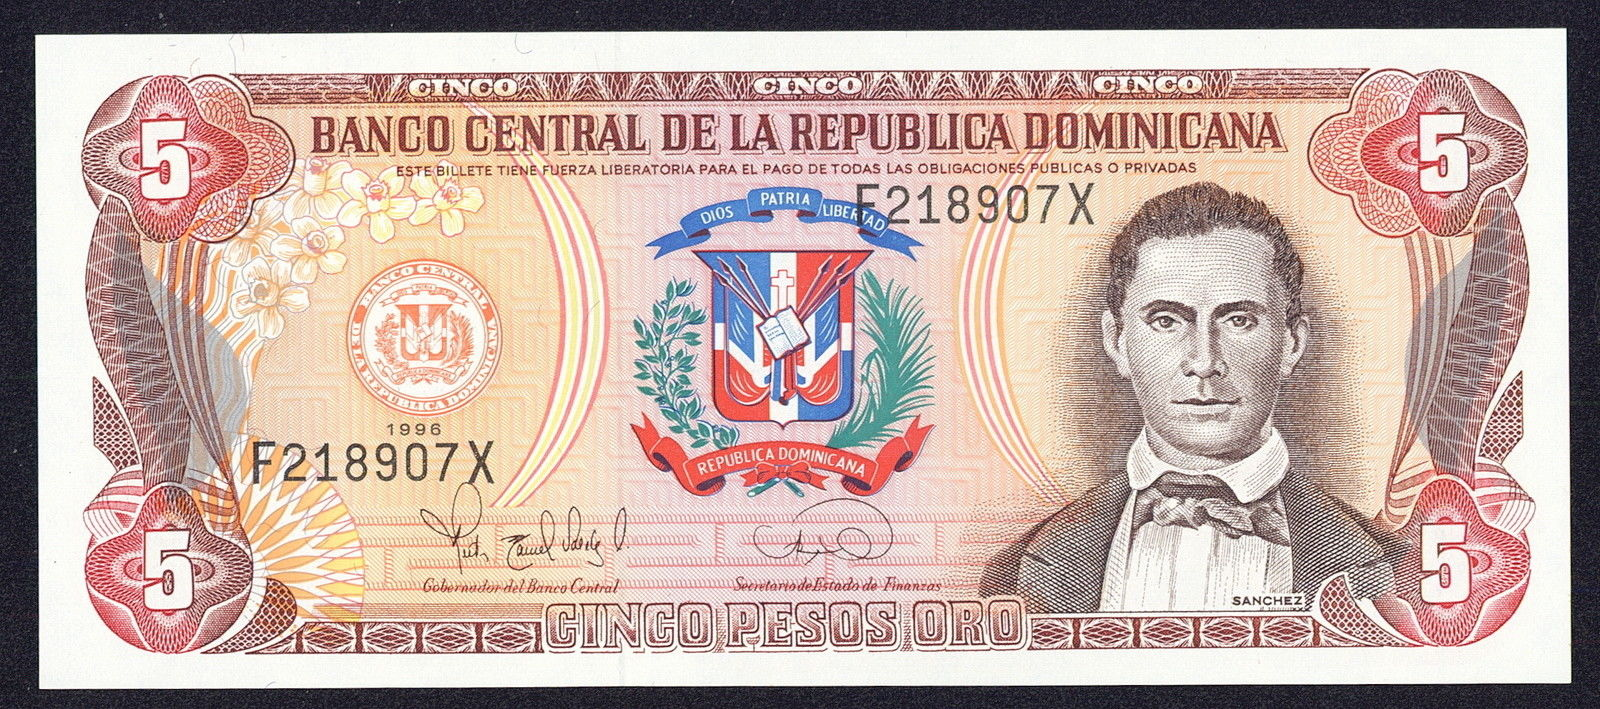 Фото валюты